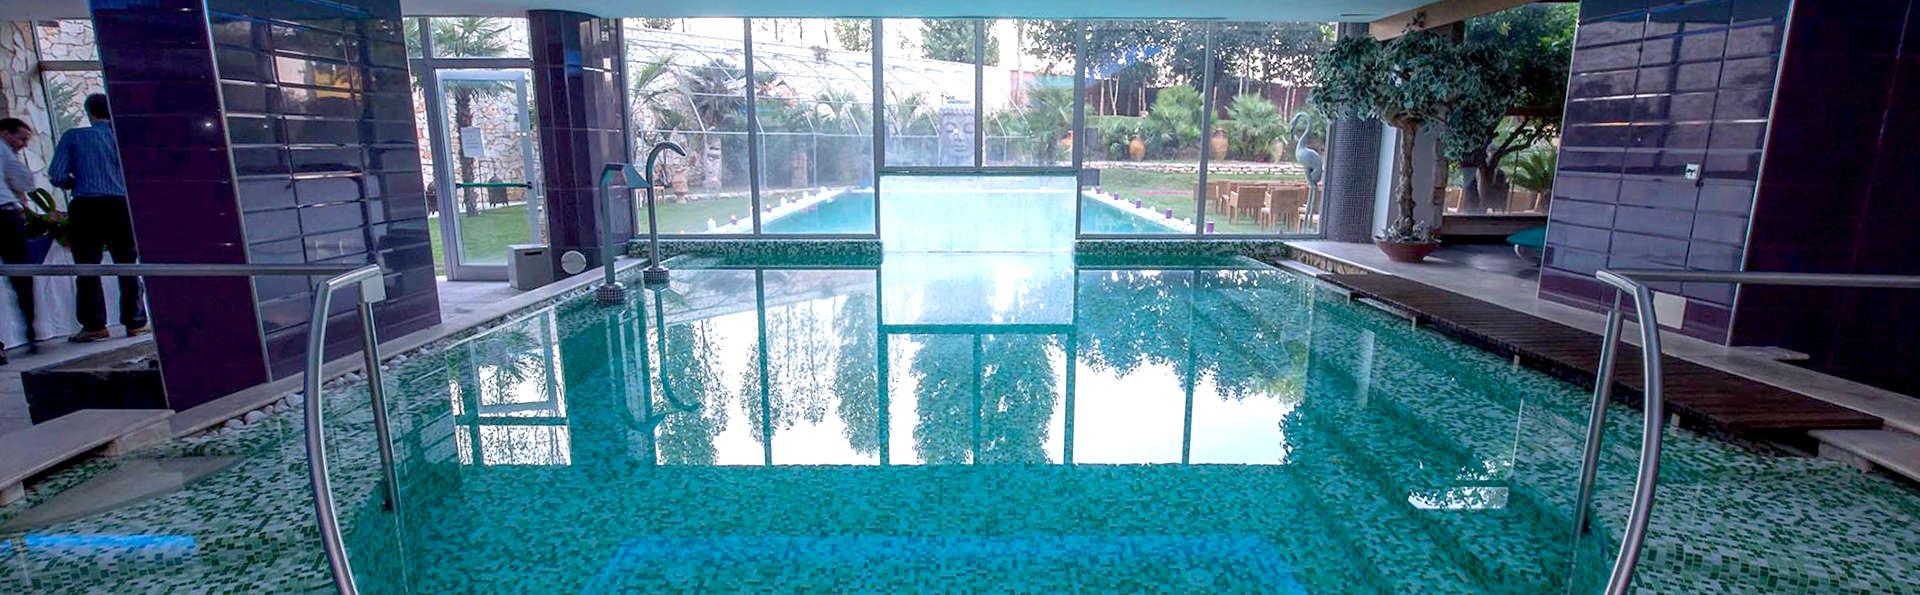 Hotel Antares - Edit_Spa.jpg